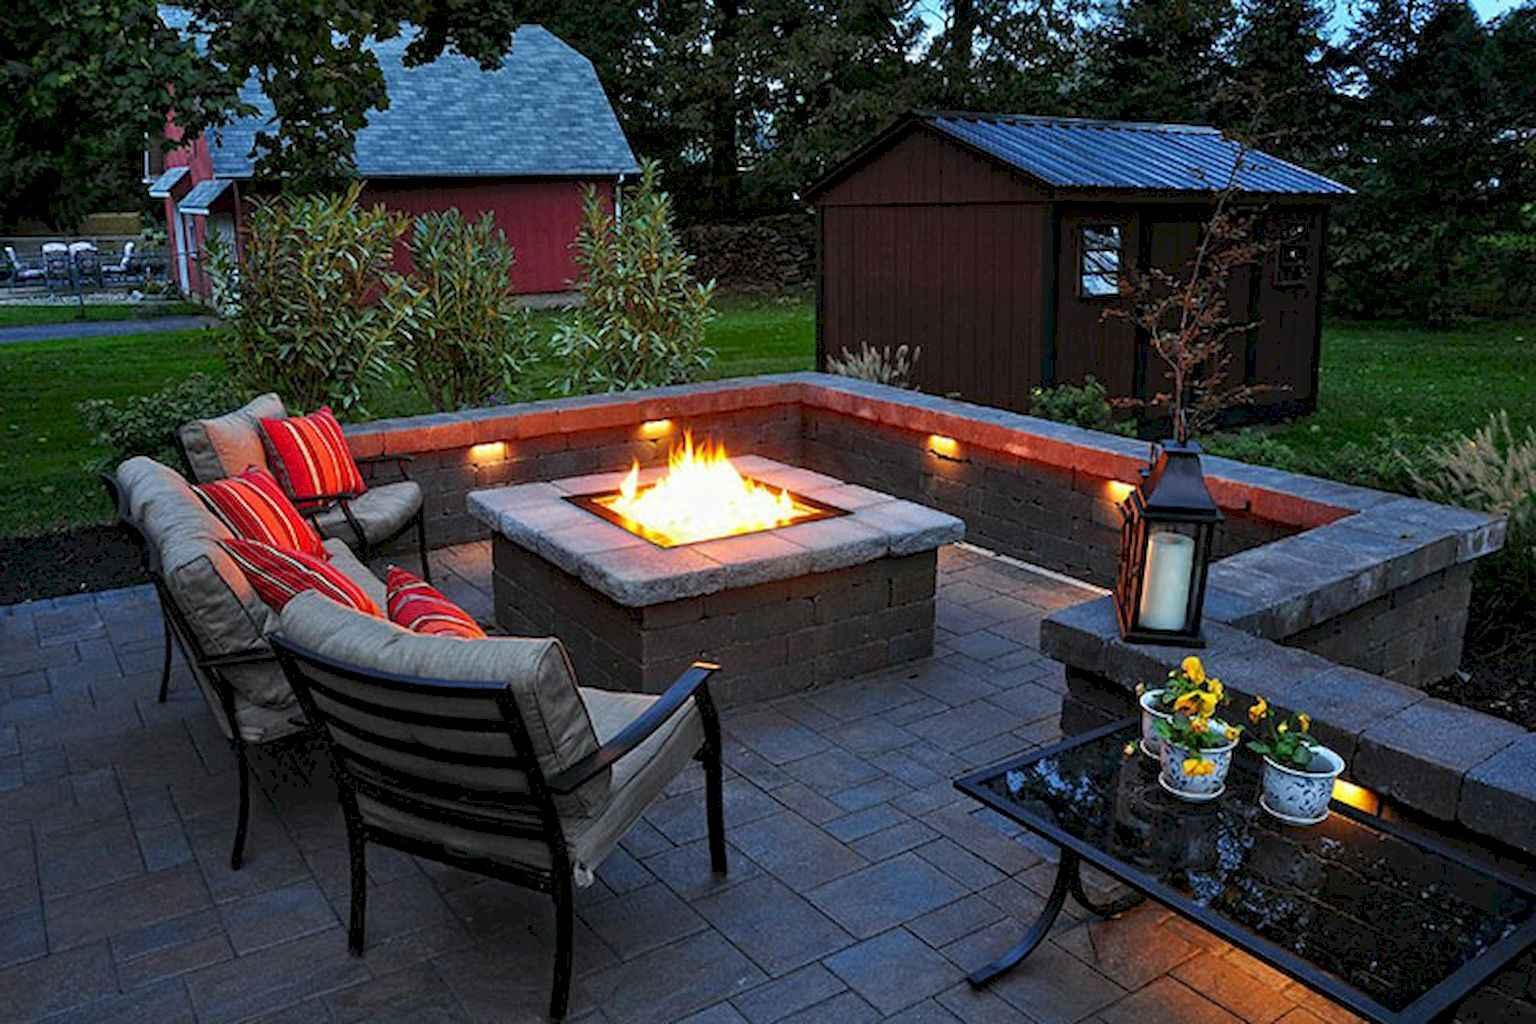 60 Beautiful Backyard Fire Pit Ideas Decoration and Remodel (46)